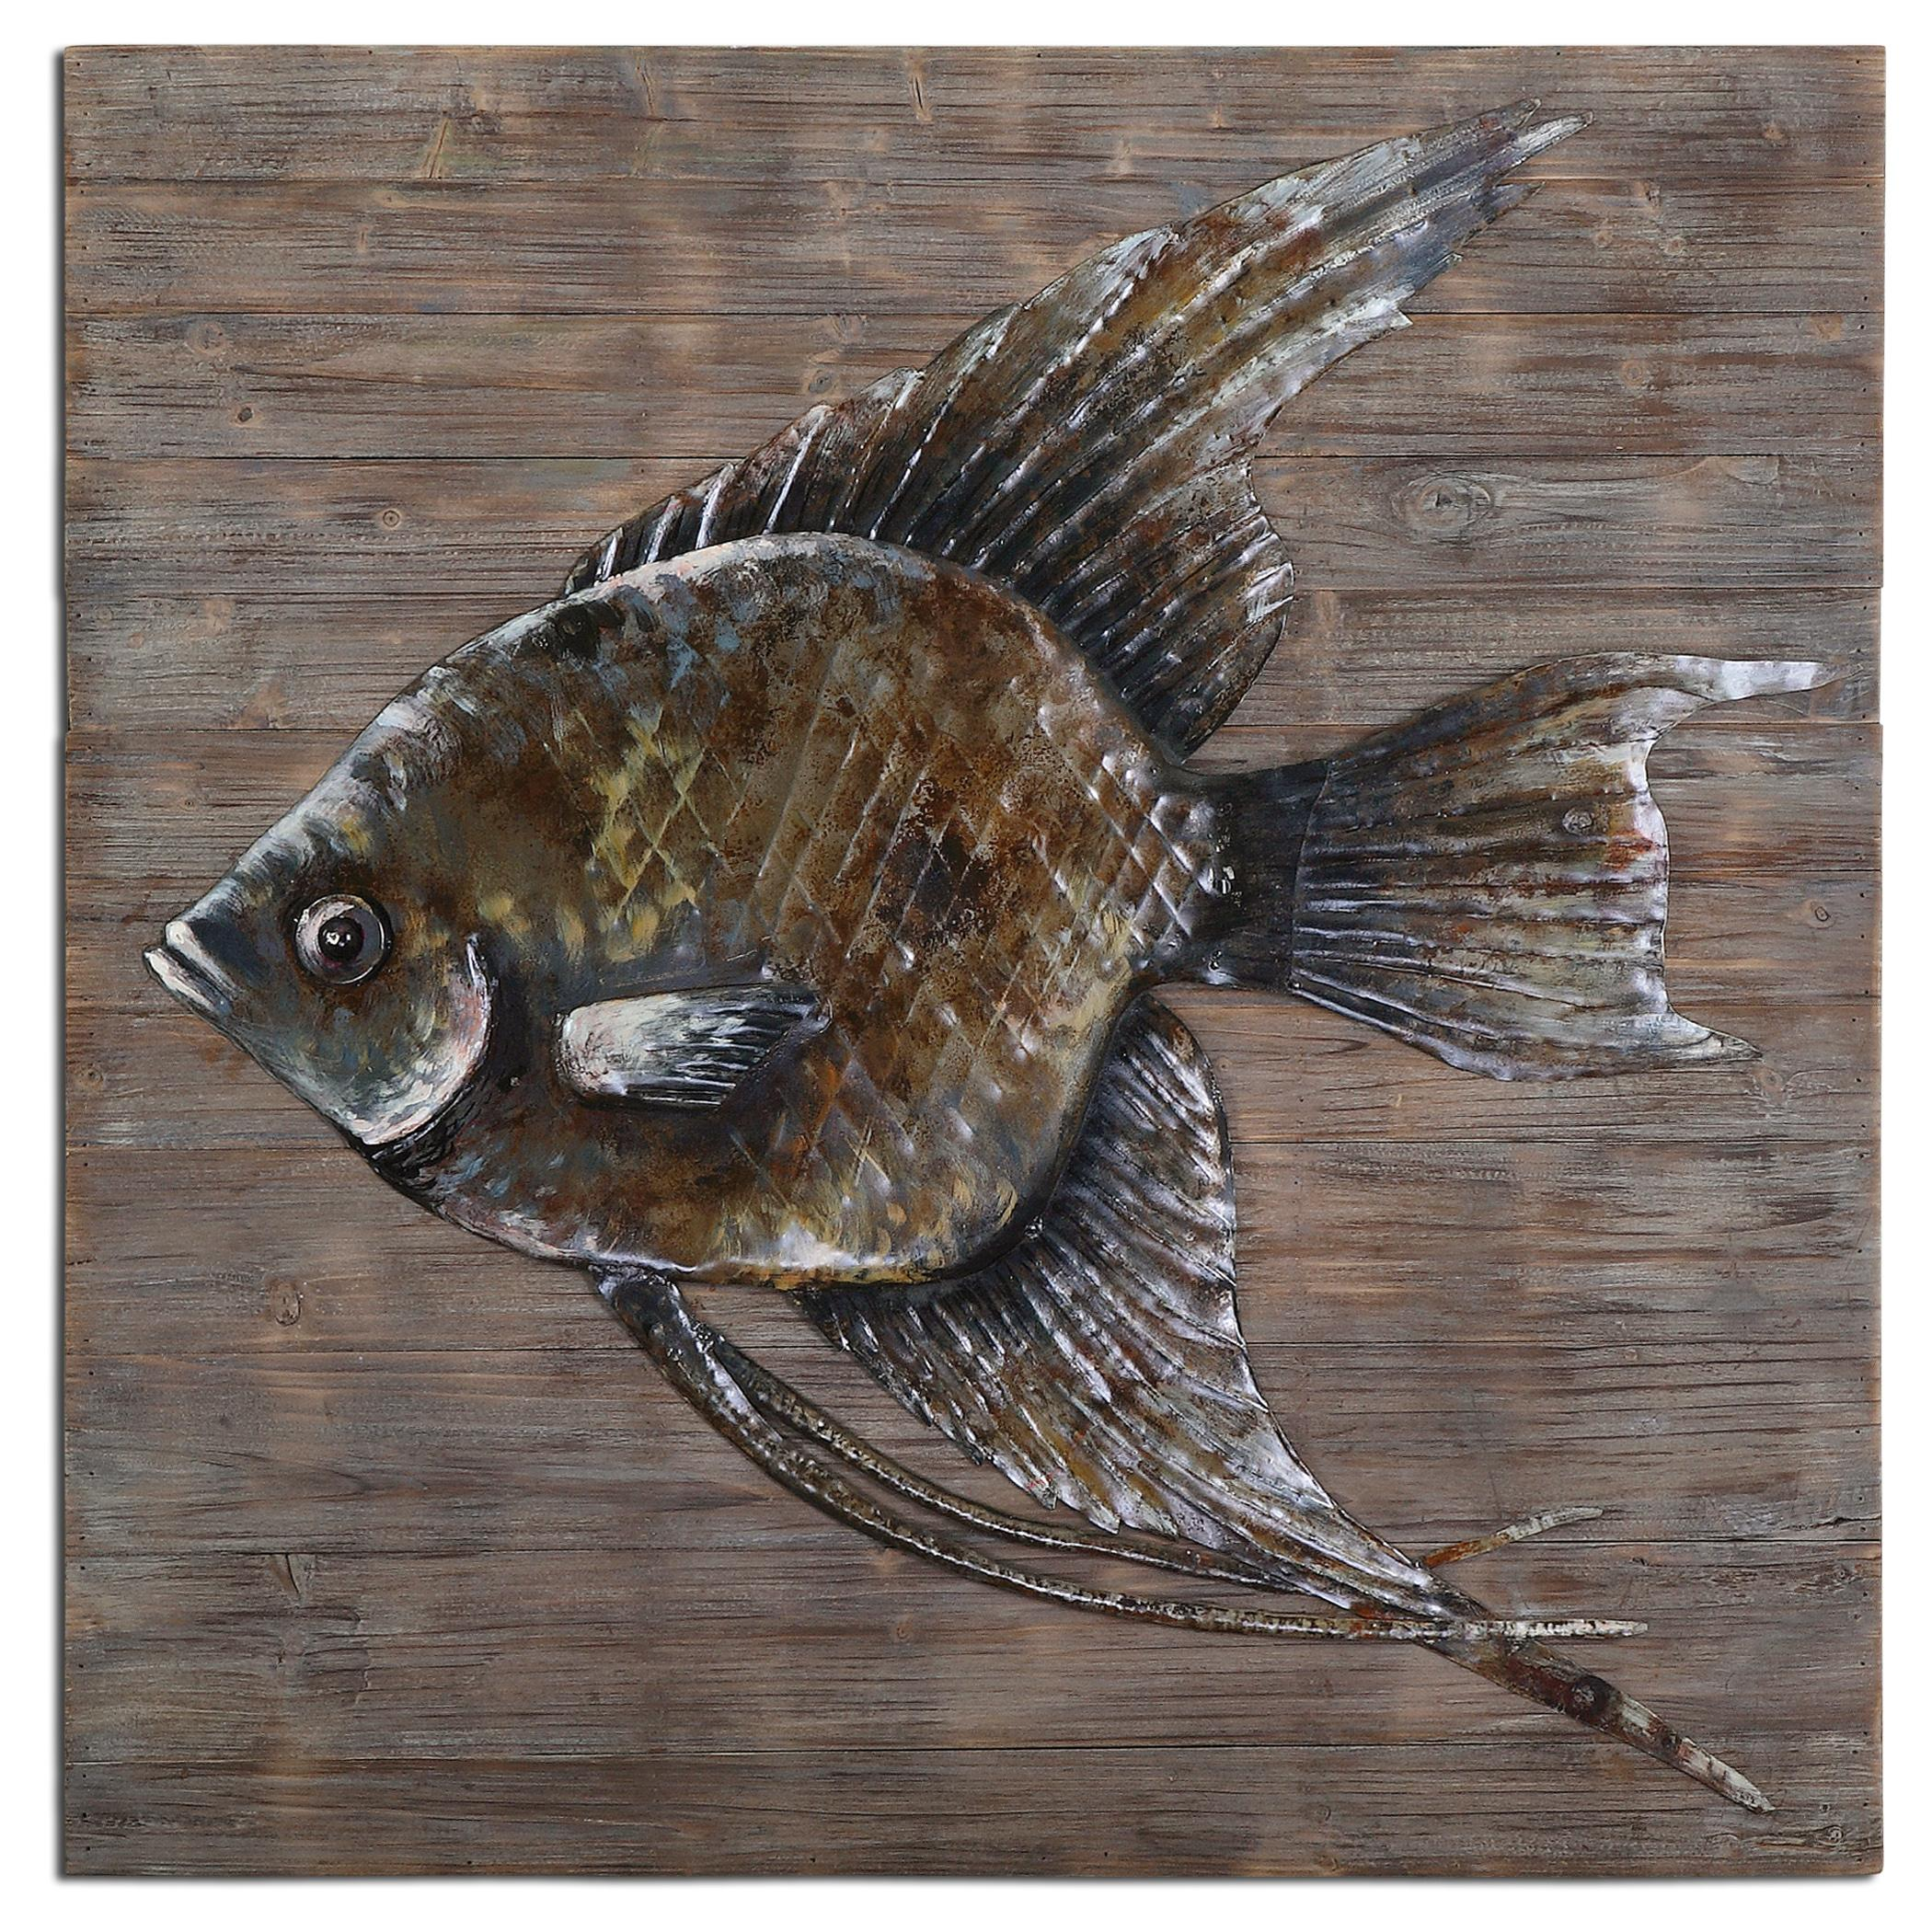 Uttermost Alternative Wall Decor Iron Fish Wall Art - Item Number: 04273